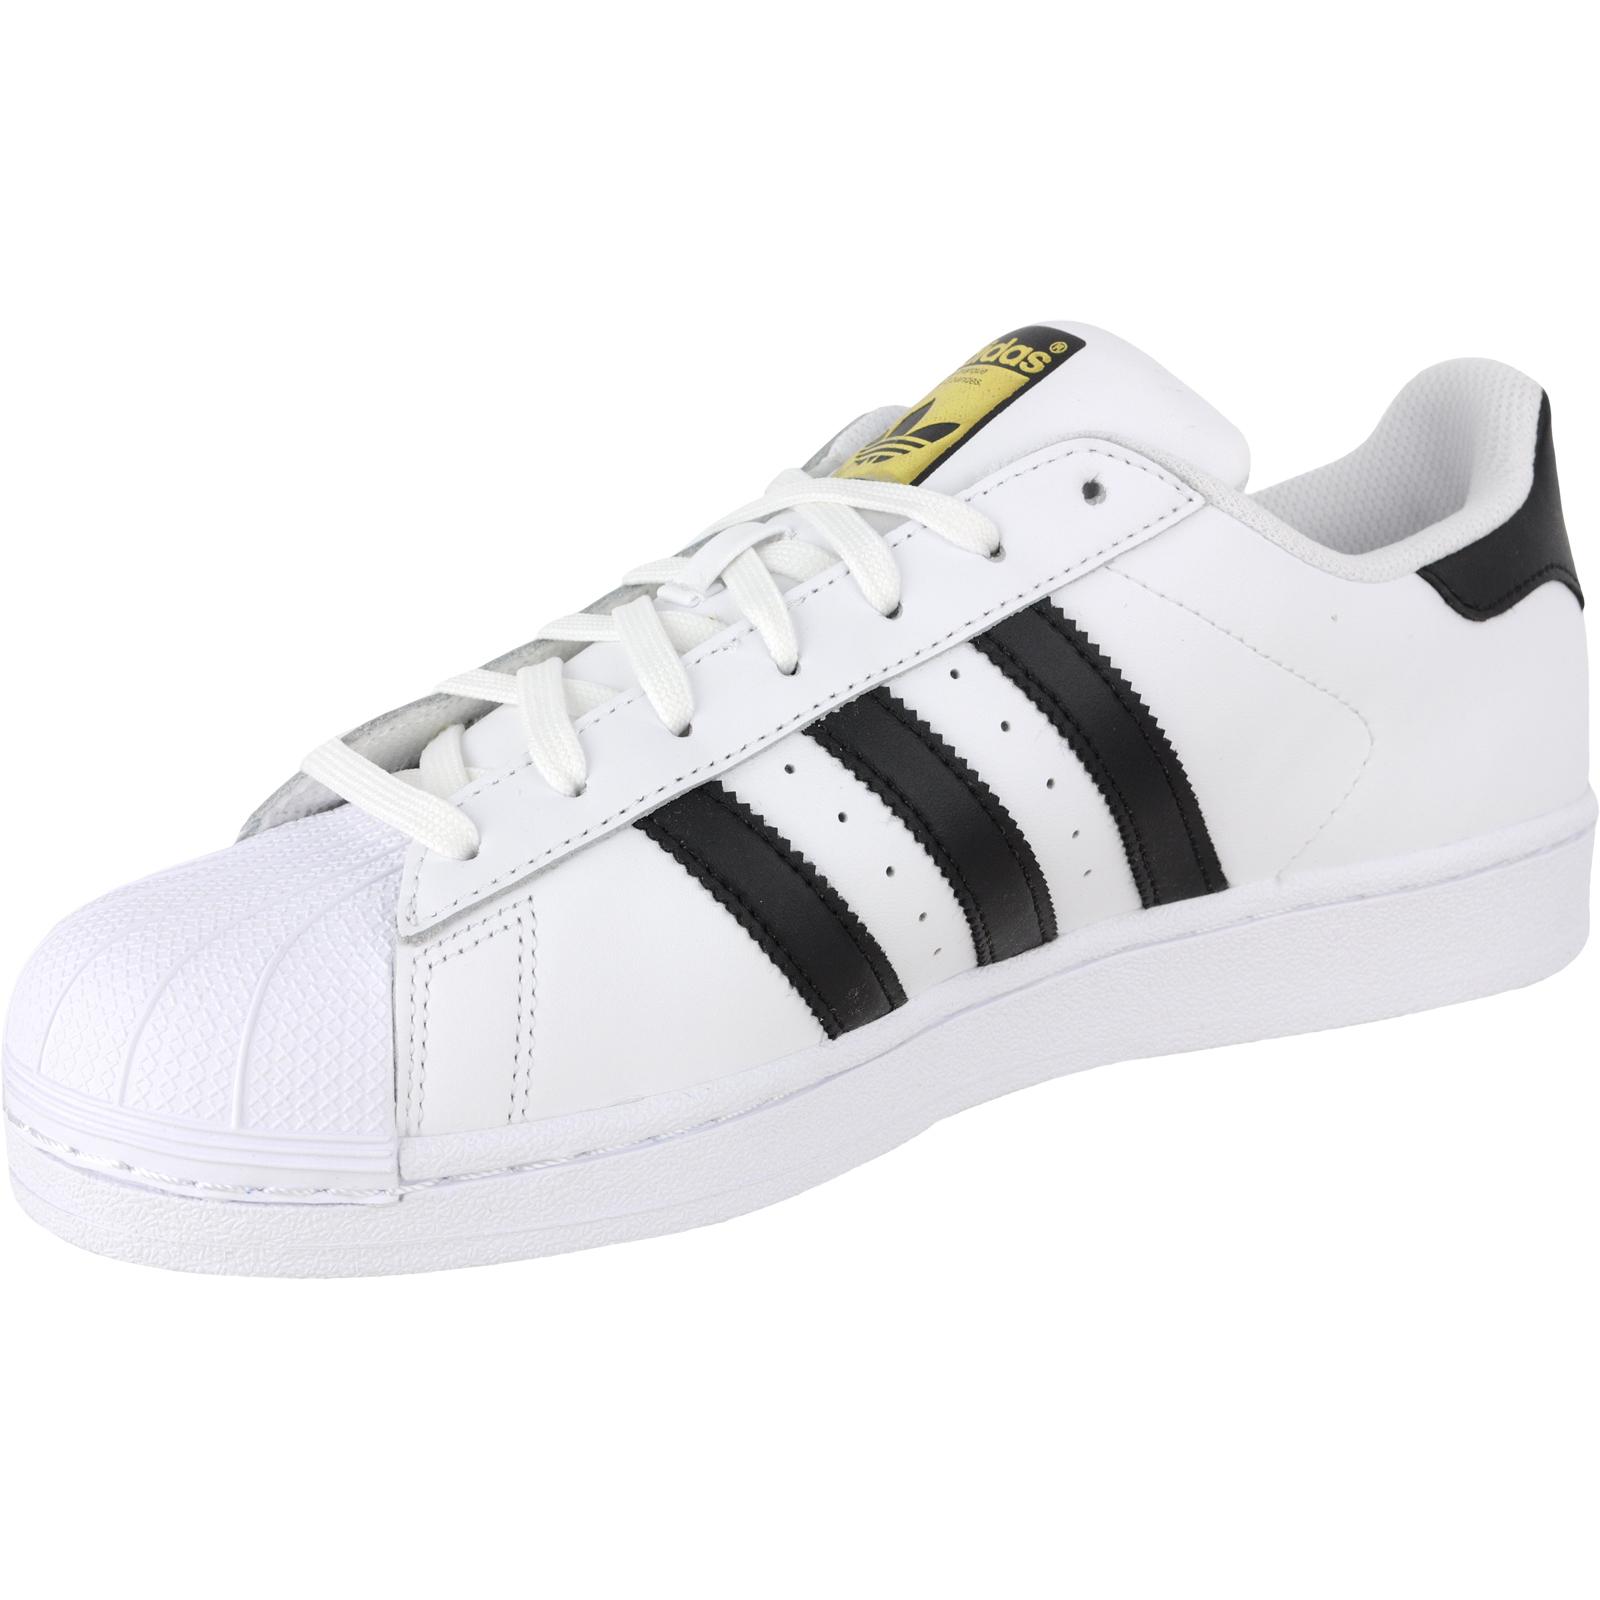 Previous  Next. 1  2. Previous  Next. Pantofi sport unisex adidas Originals  Superstar C77124 c5f9a8d6f2bc